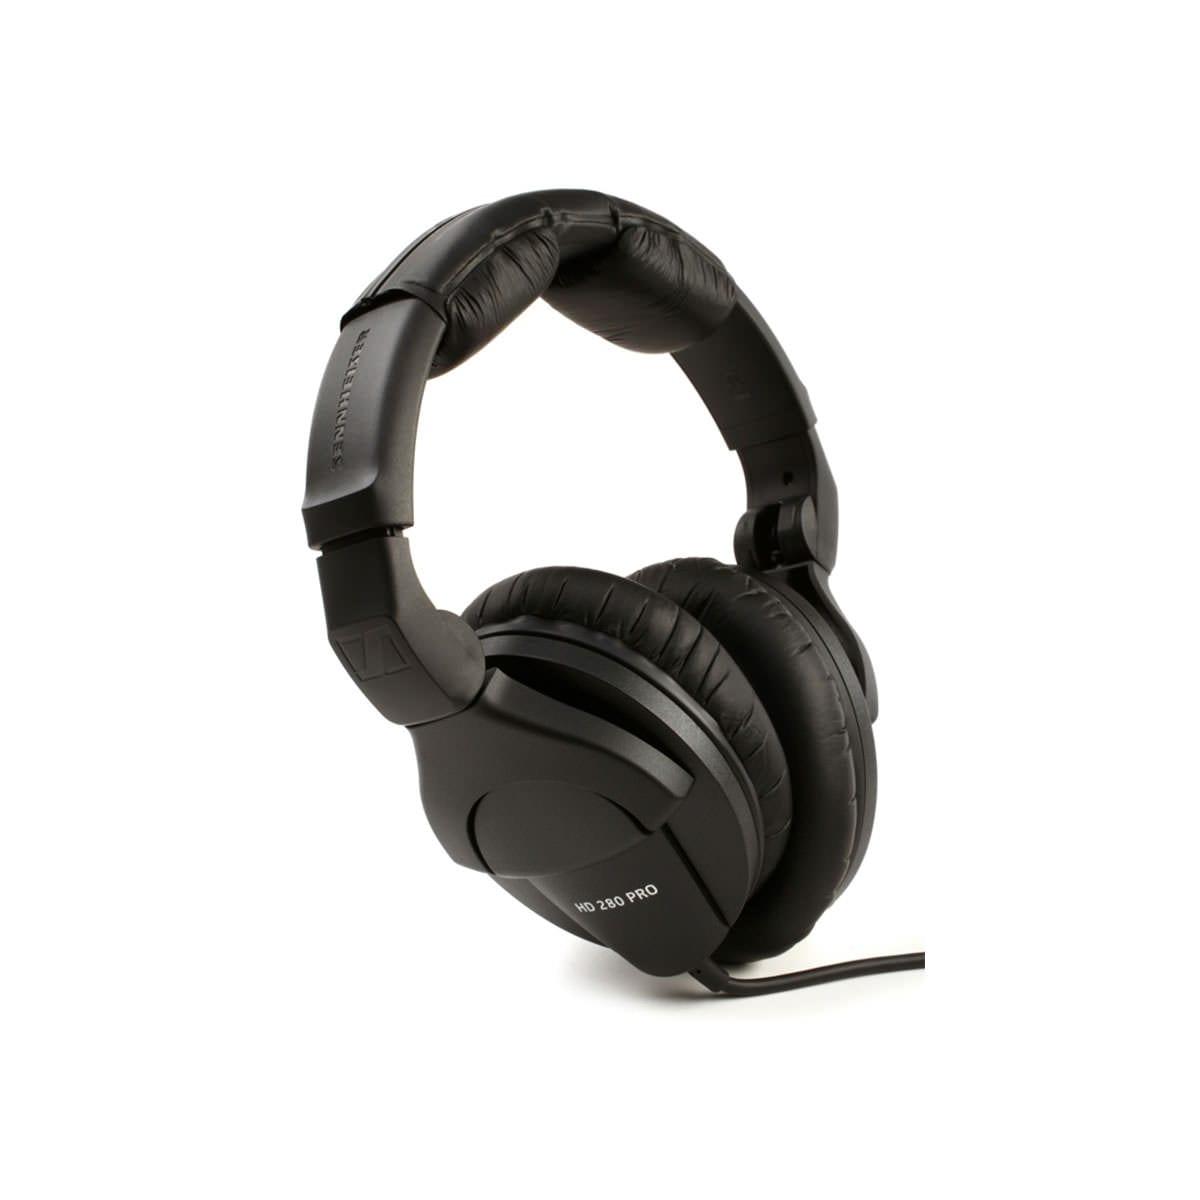 f5c9e5a4759 Shure SRH 440 Studio Headphones. Sennheiser HD 280 Pro Headphones